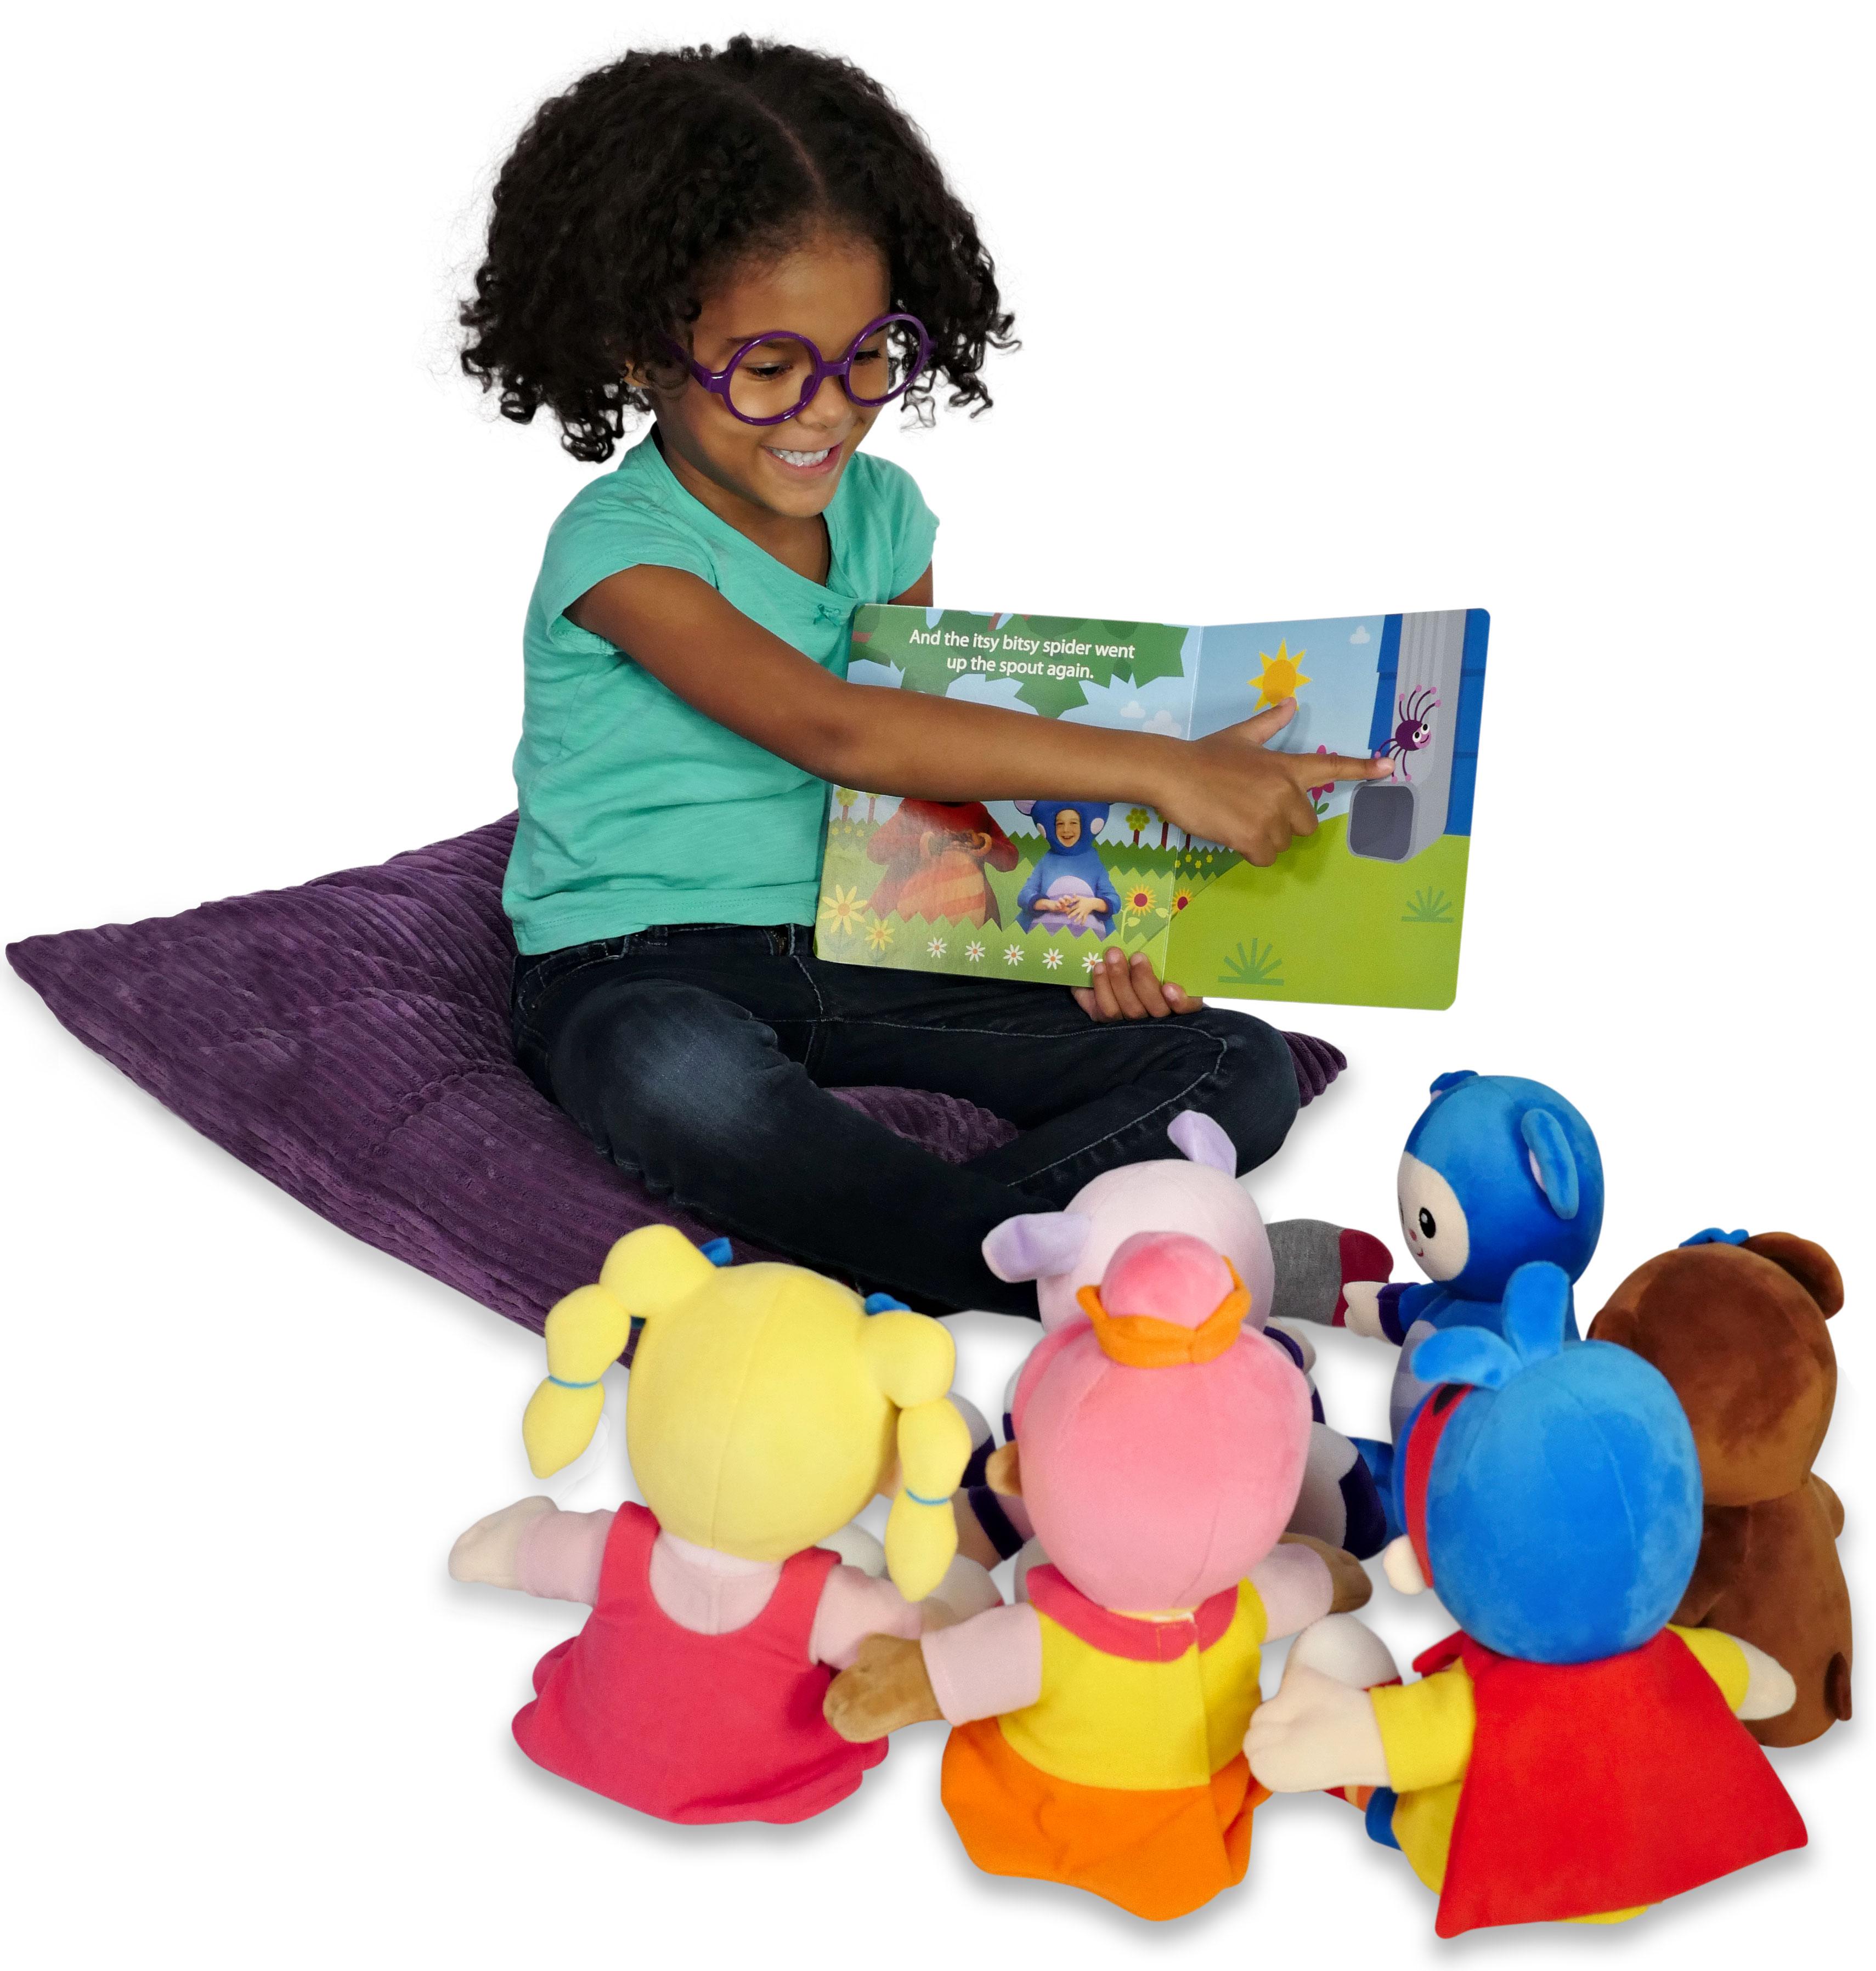 Girl reading to plush